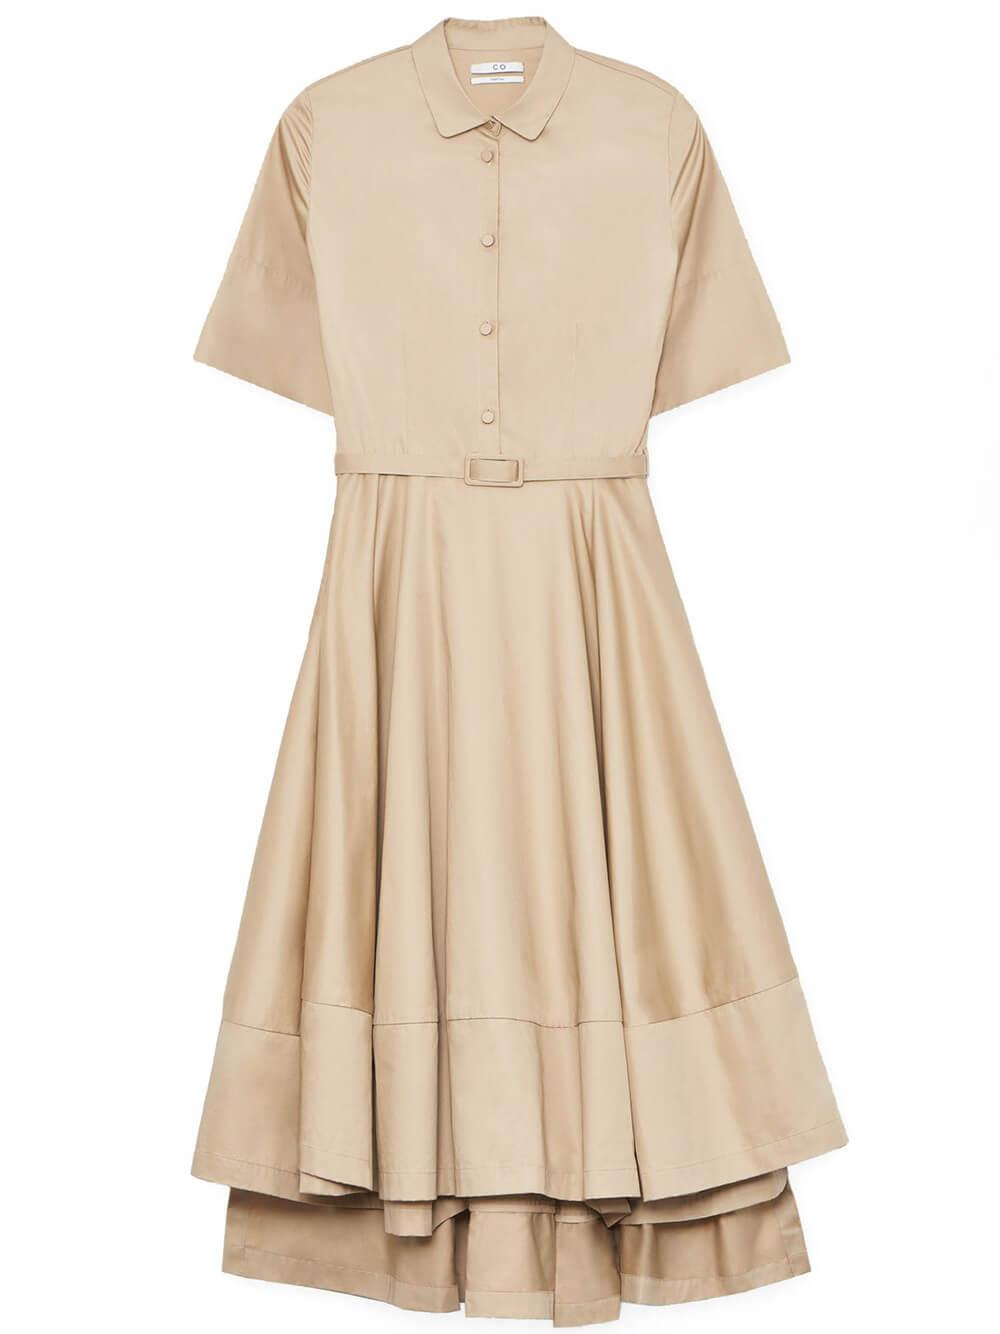 Short Sleeved Flared Dress Item # 4448STN-ESSN